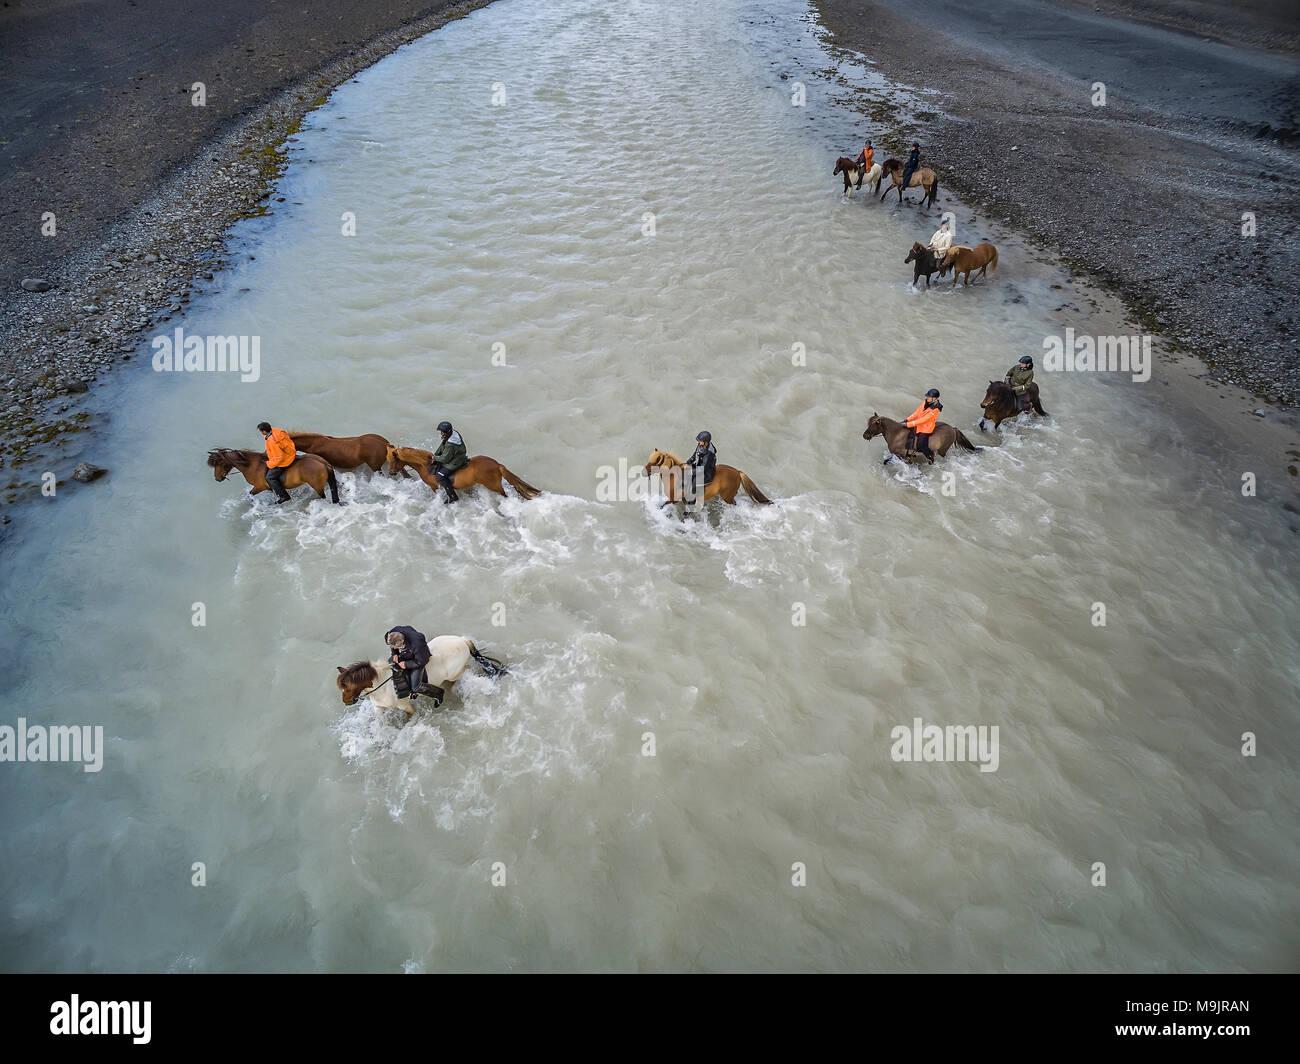 Horses crossing Farid glacial river near Hagafellsjokull Glacier, Iceland - Stock Image